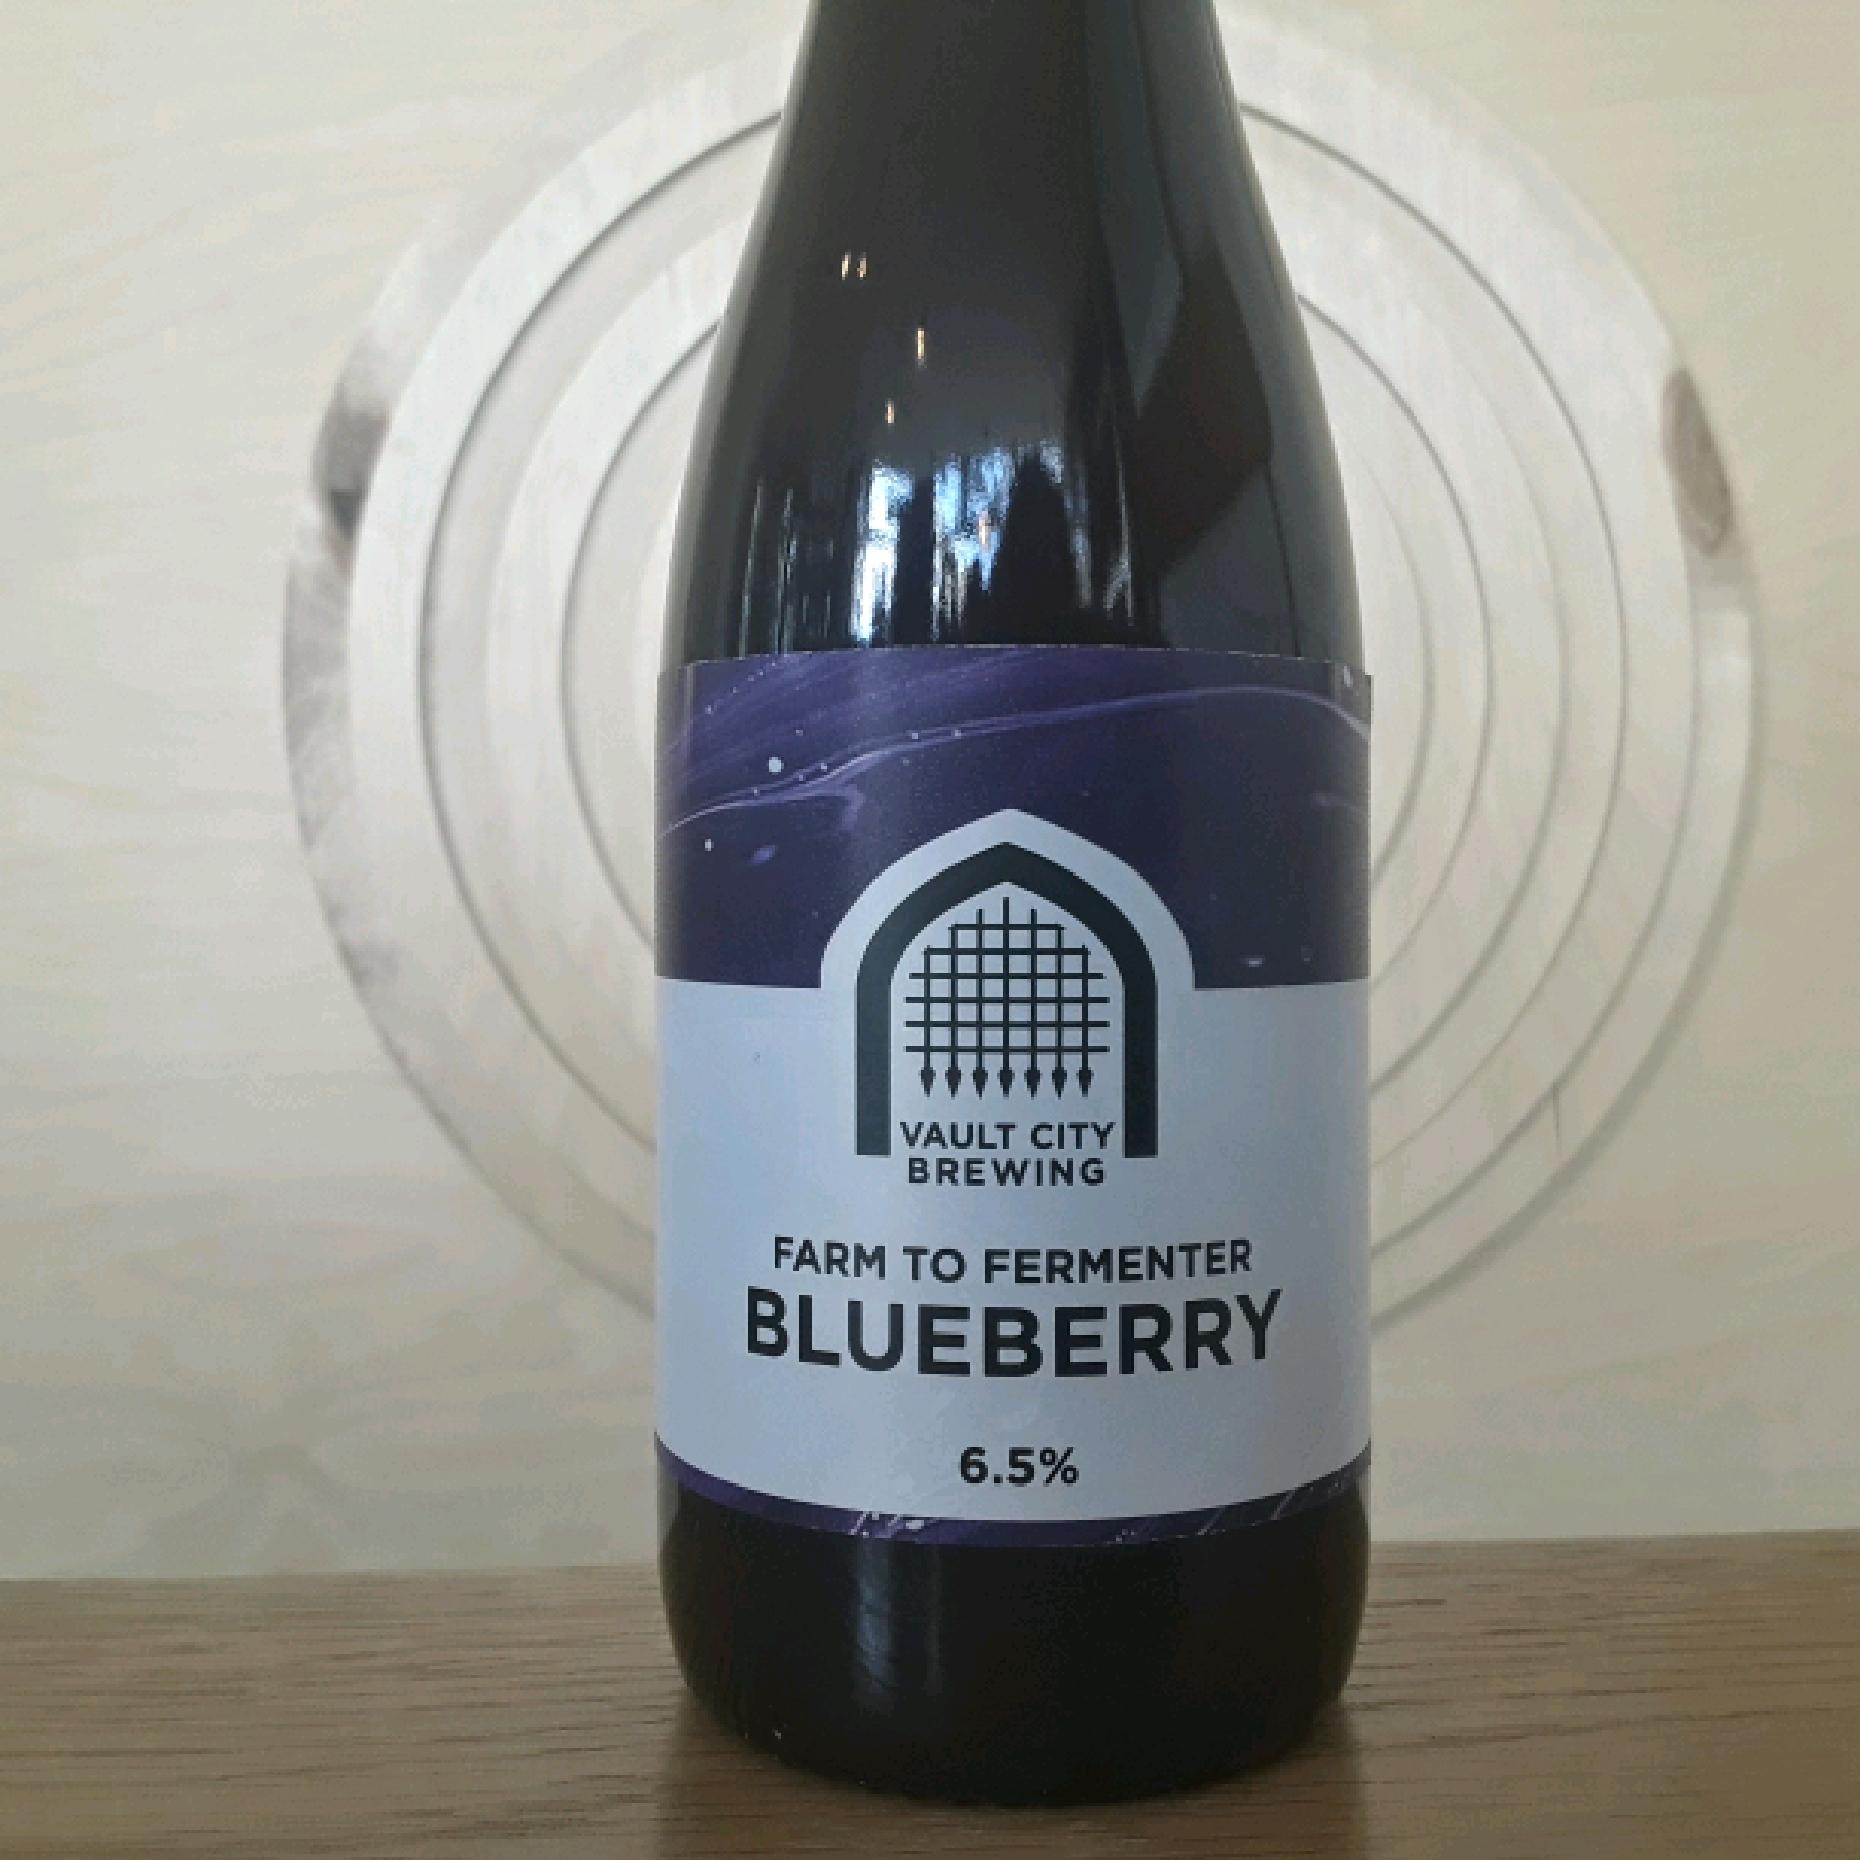 Vault City Brewing | Farm to Fermenter Blueberry | Sour